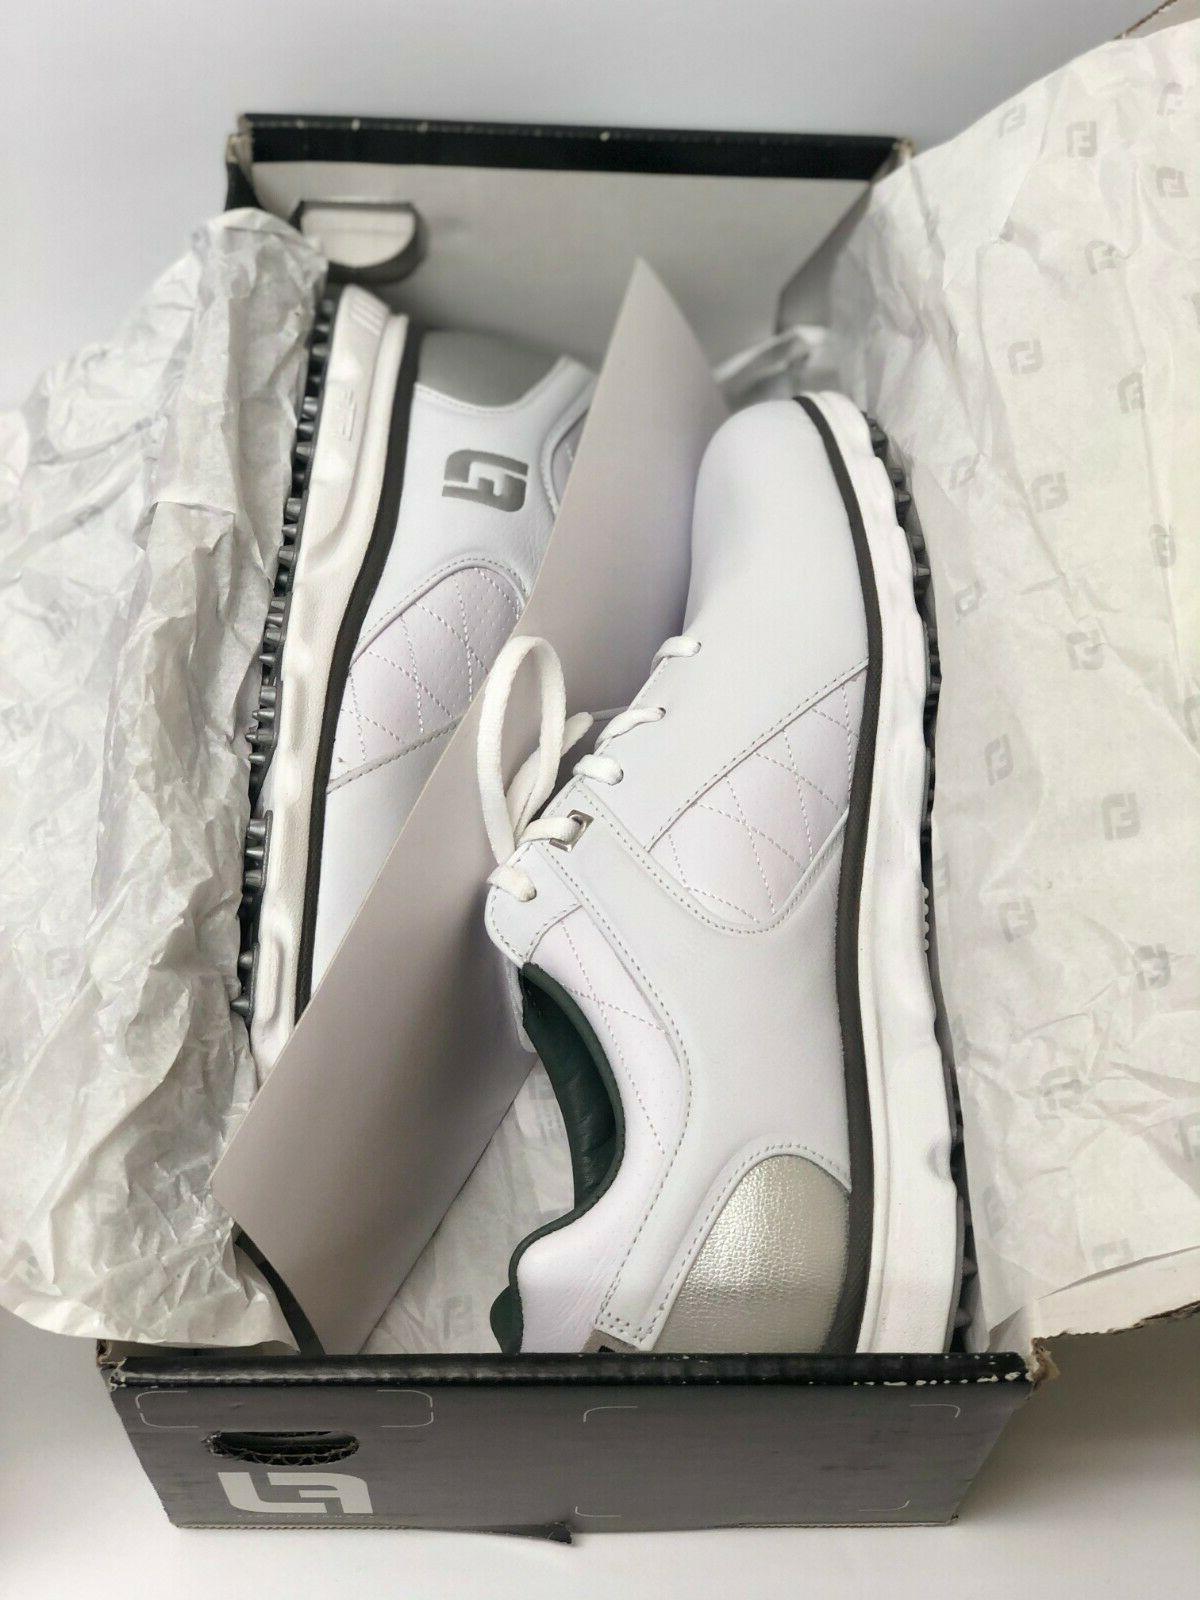 NEW Men's Footjoy SL Spikeless Shoes - 8